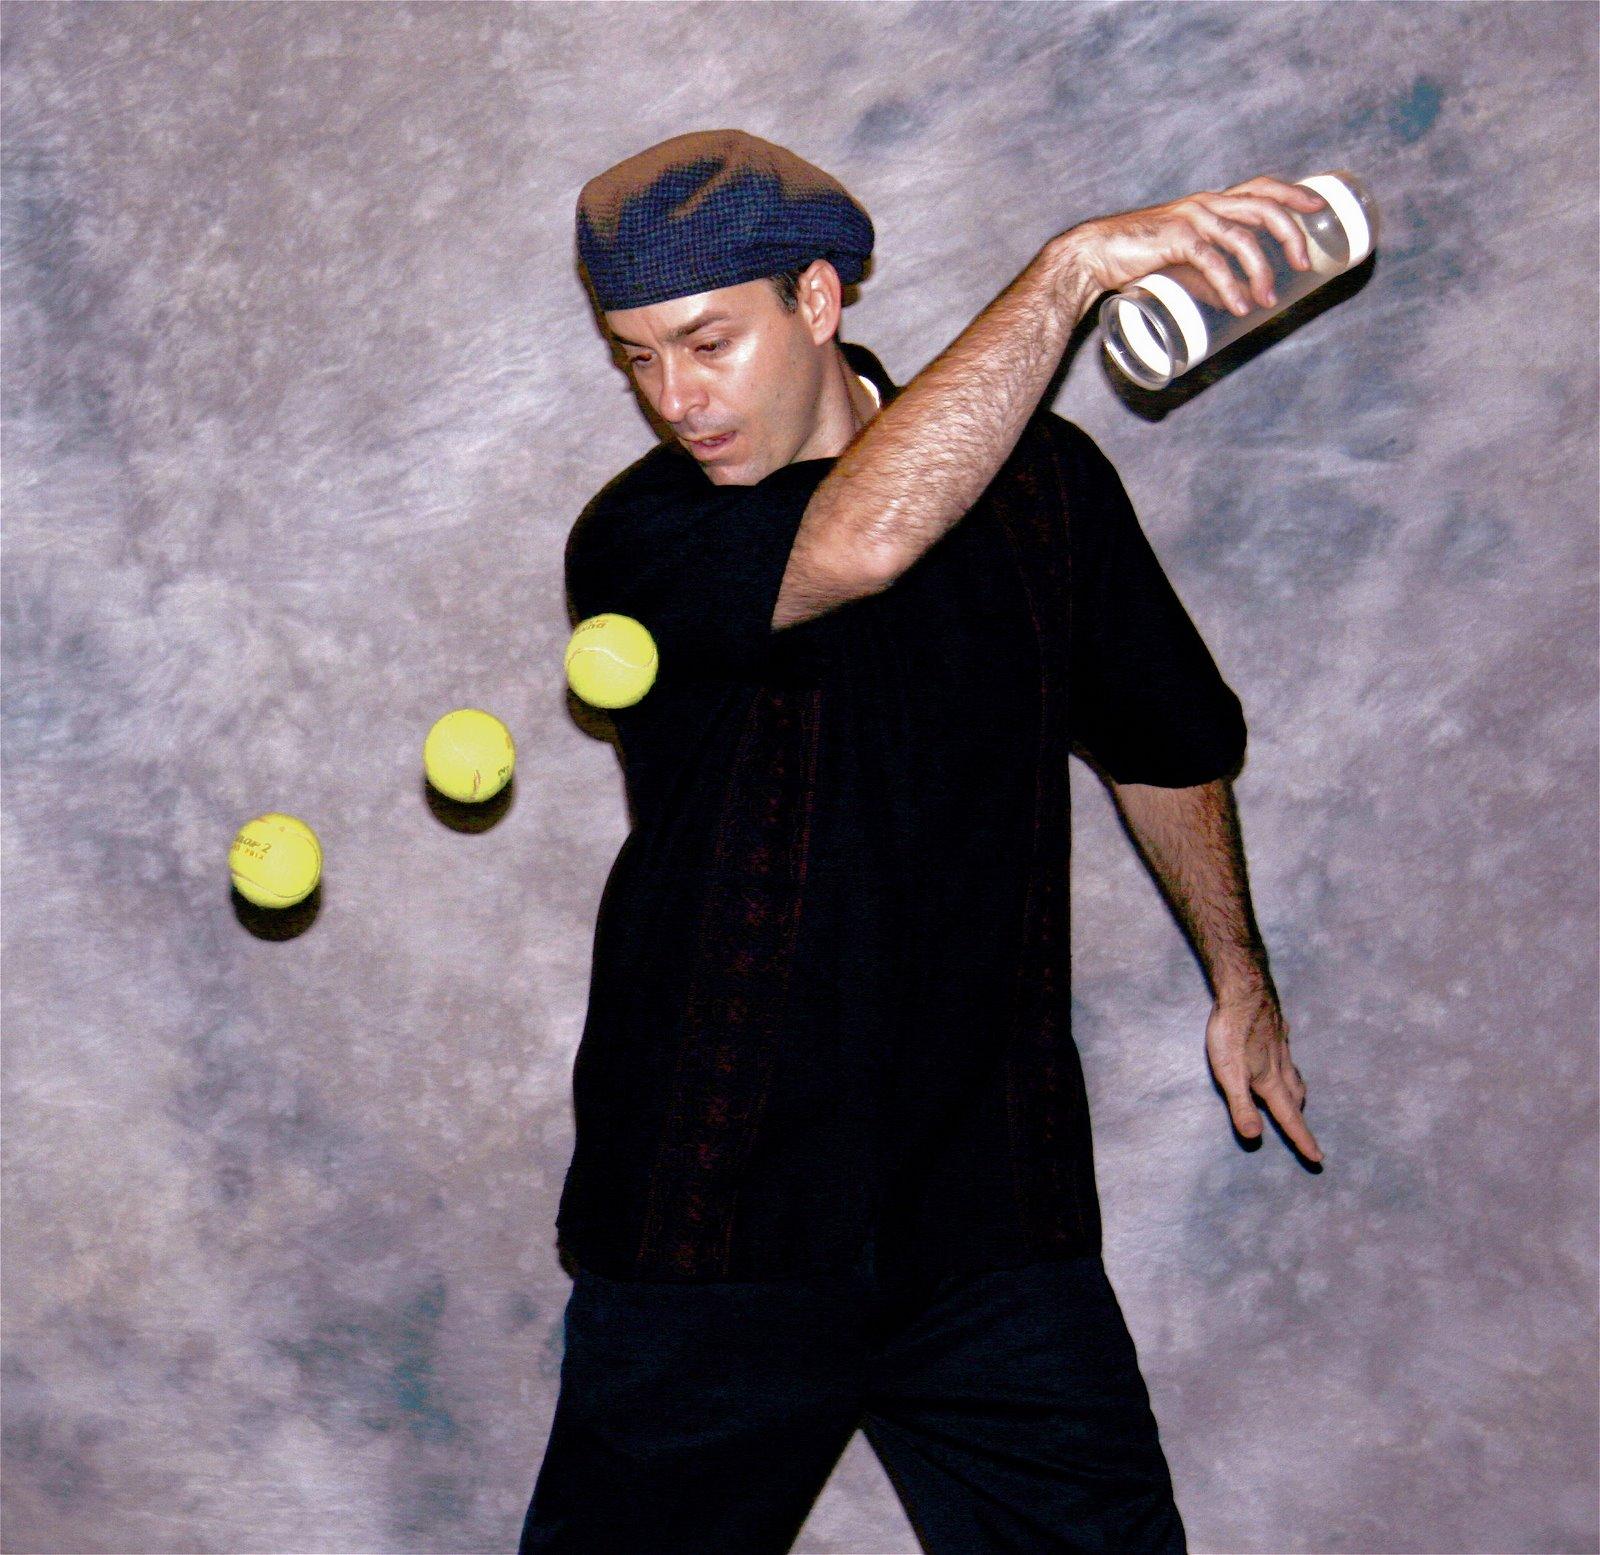 [Matt+Hall+Tennis+Ball+and+Can+Photo.htm]